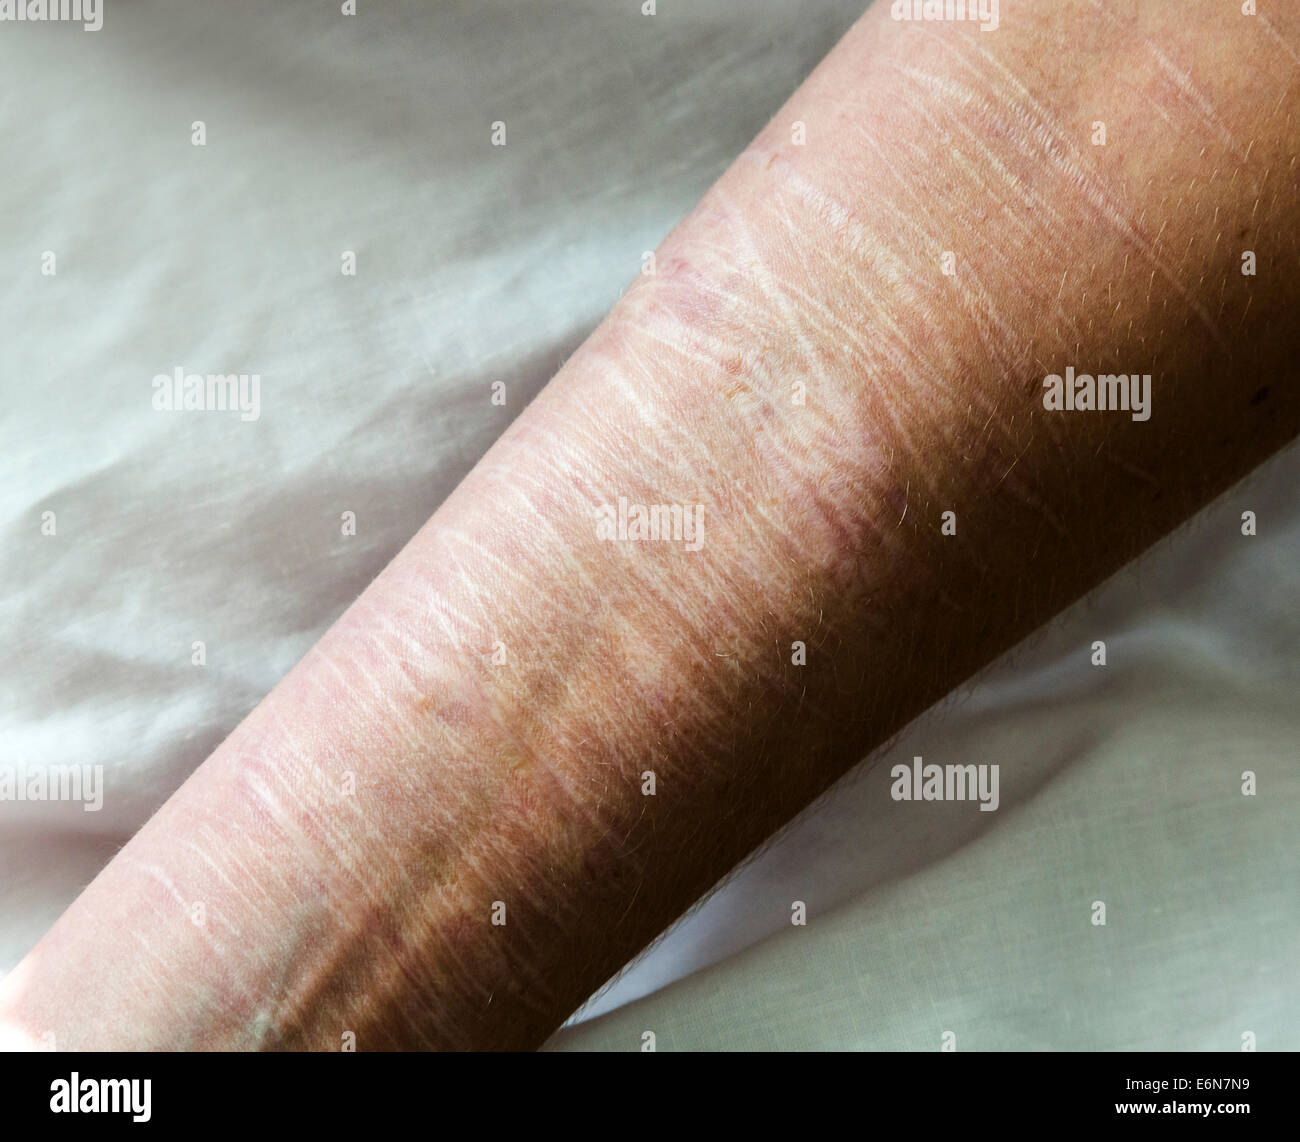 evidence of self harm on a womans arm Stock Photo